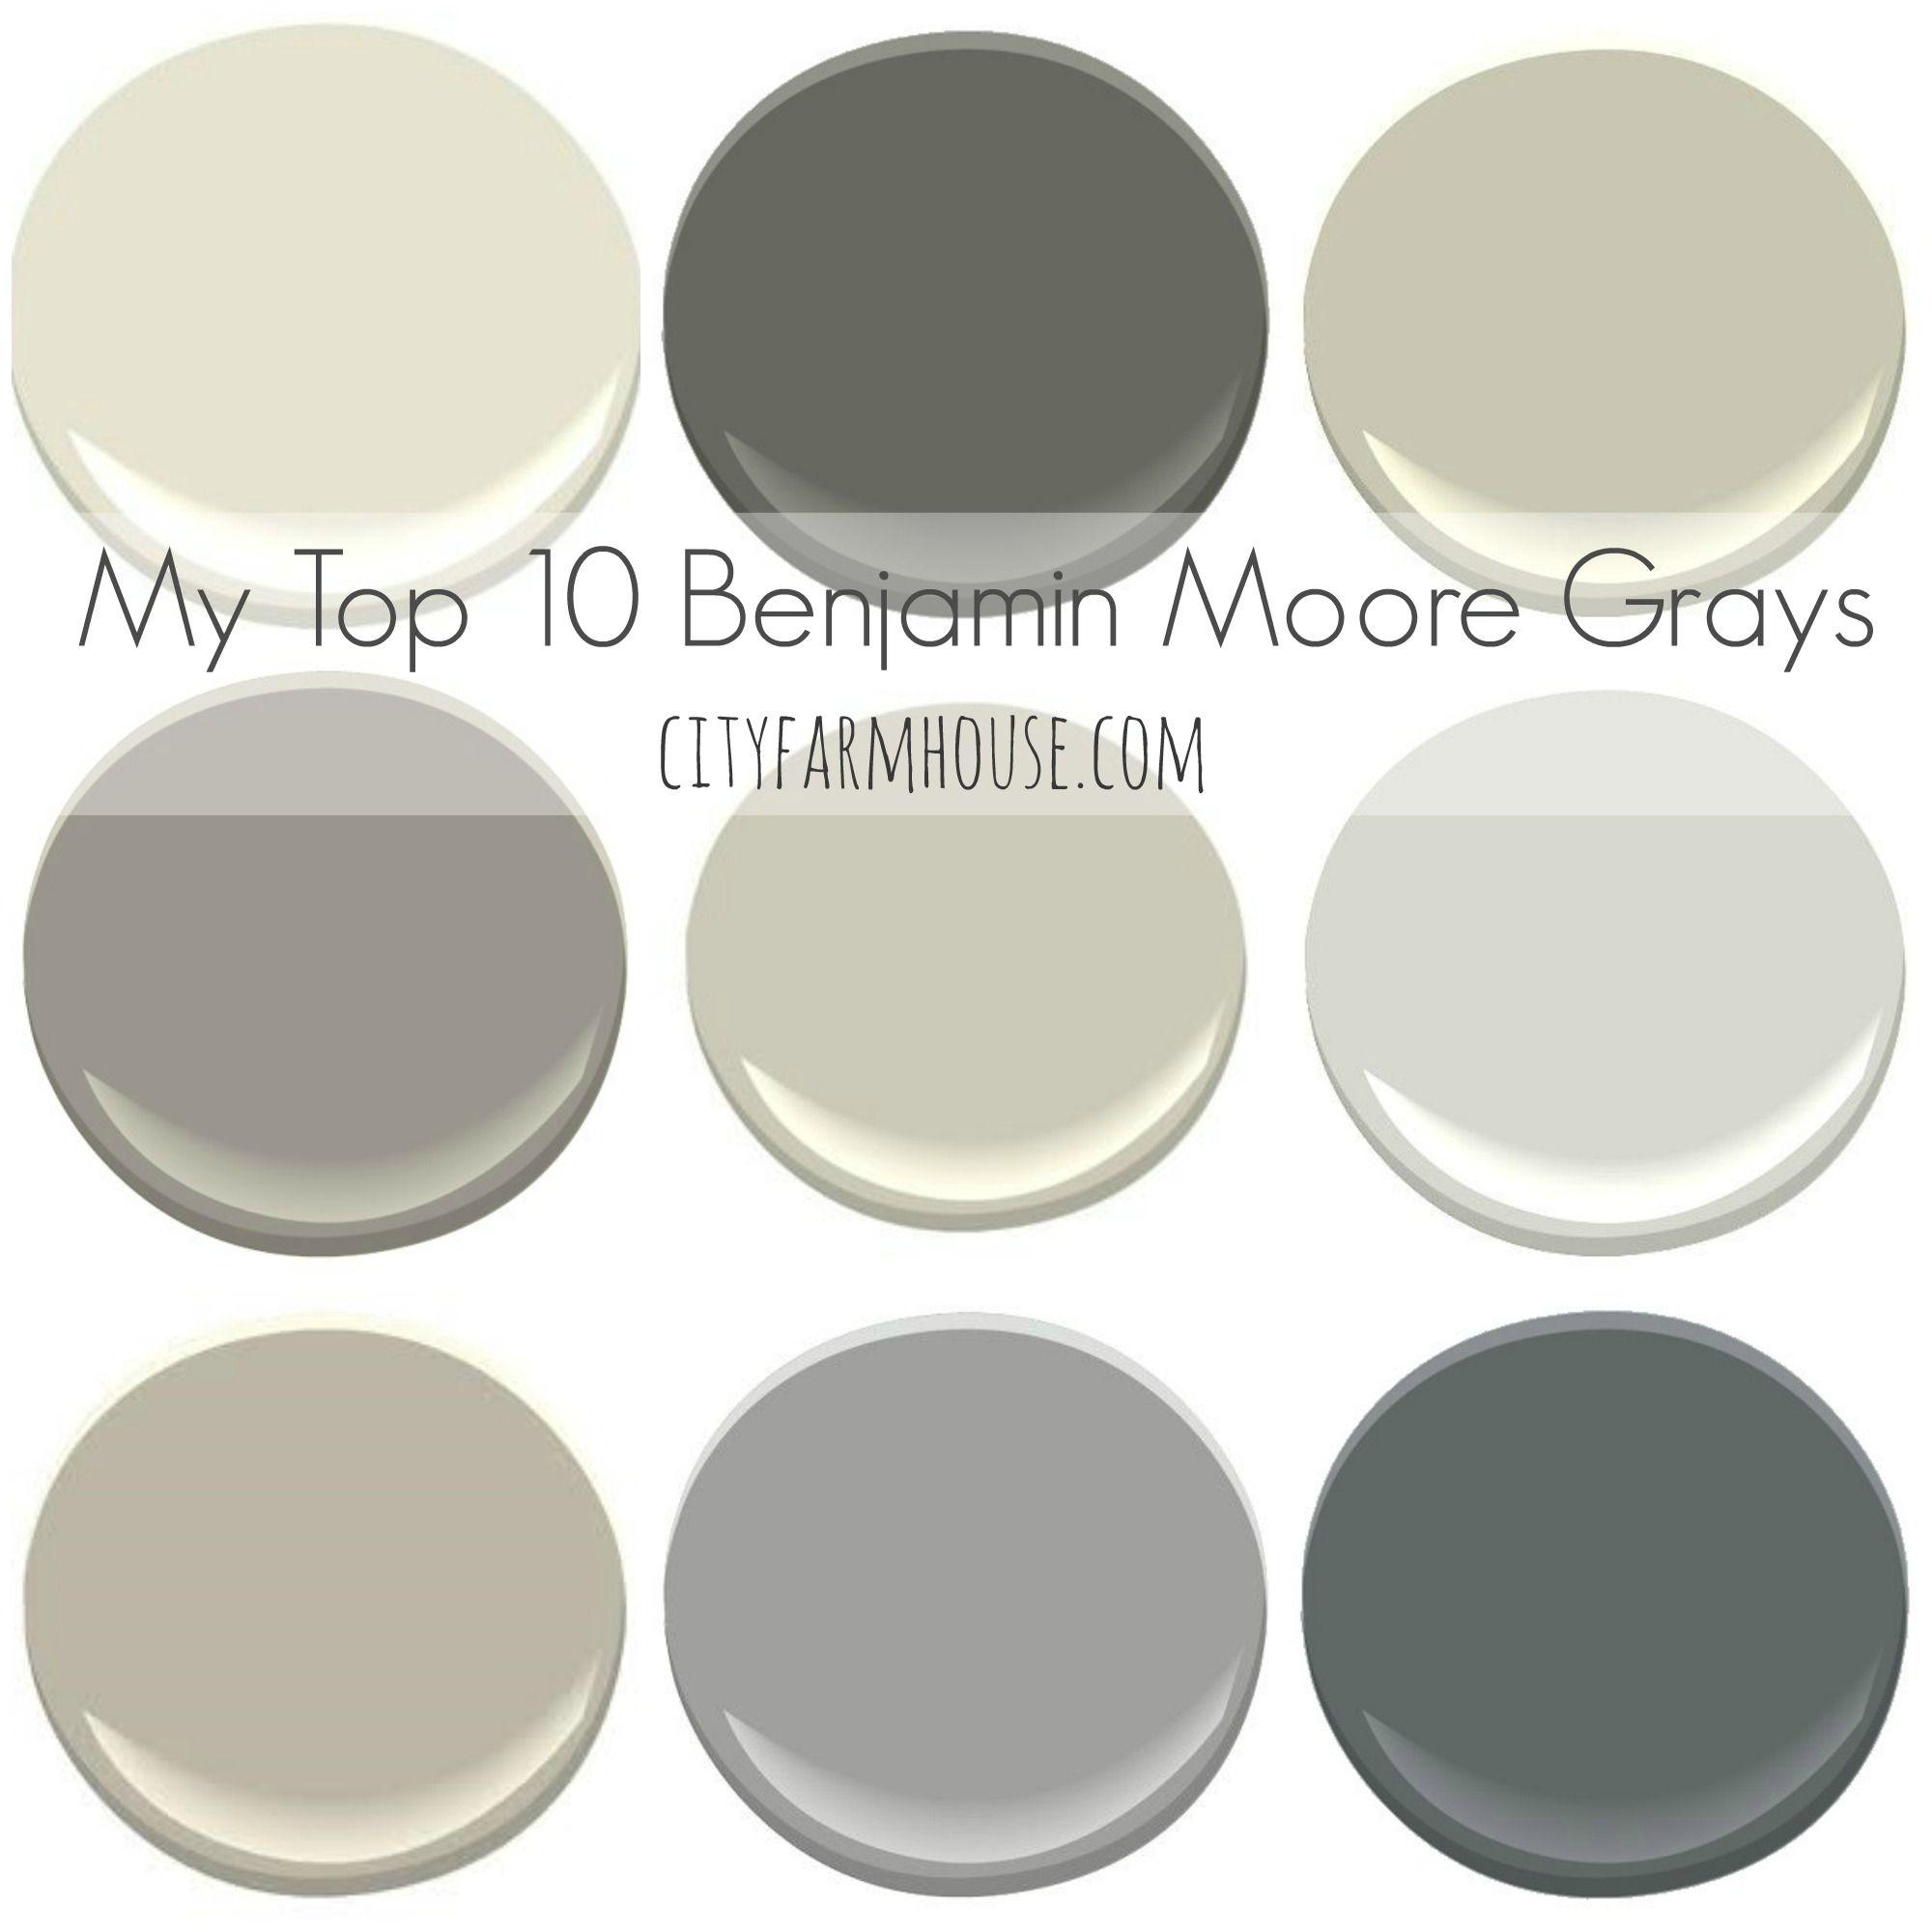 My top benjamin moore grays benjamin moore gray city farmhouse